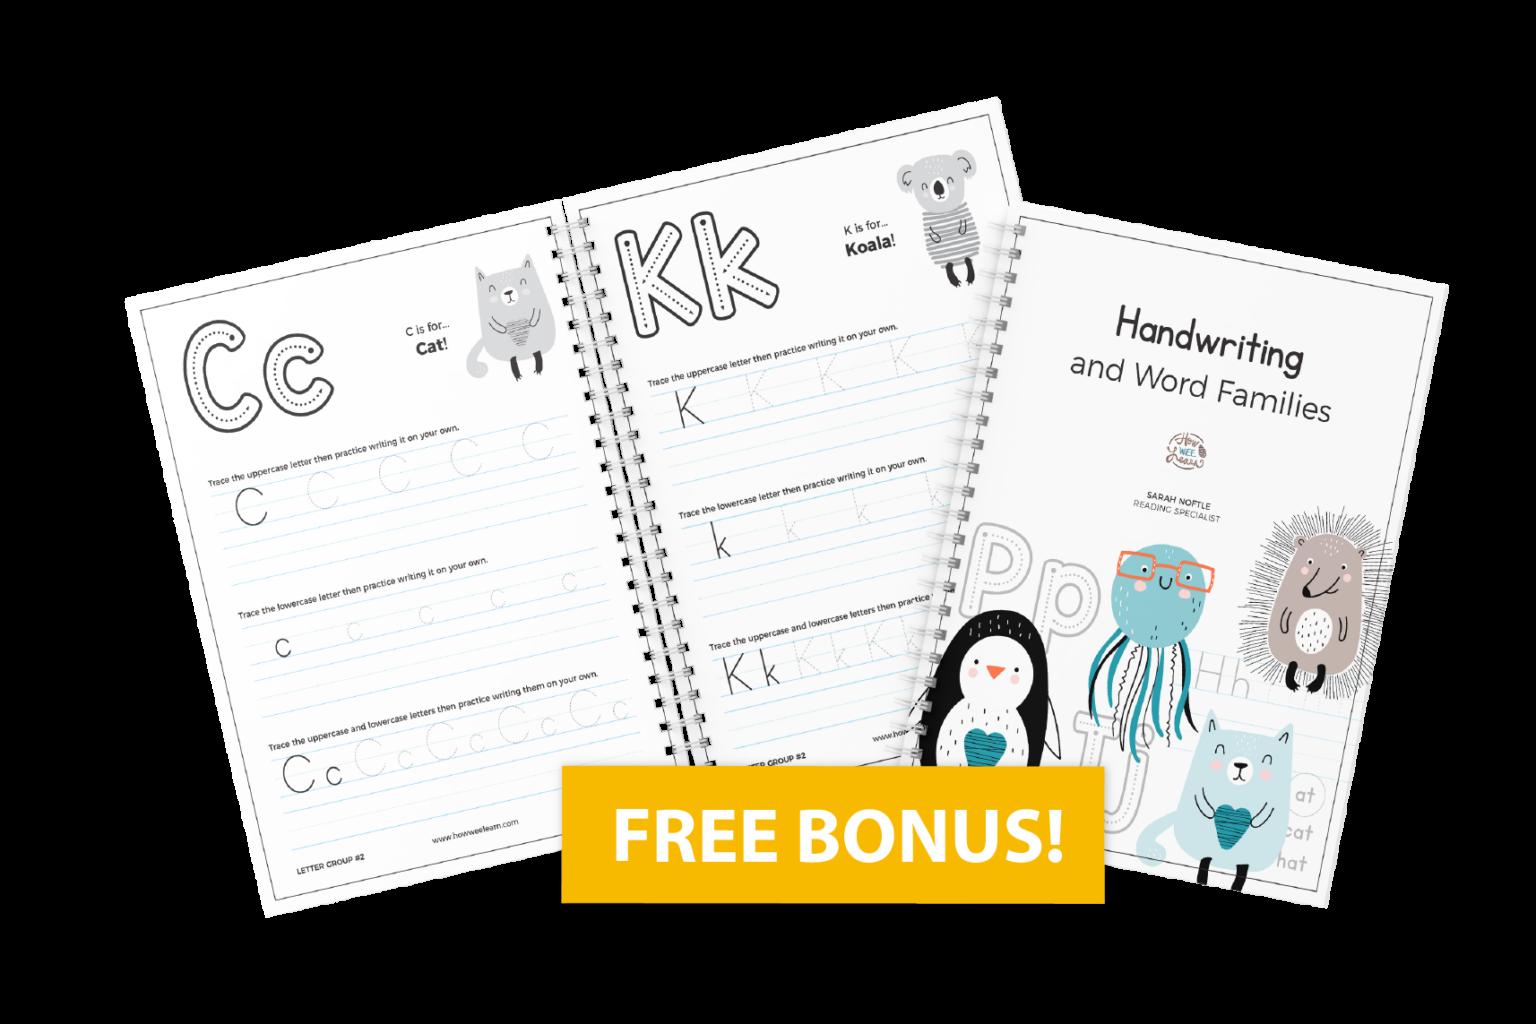 Handwriting and Word Families Free Bonus